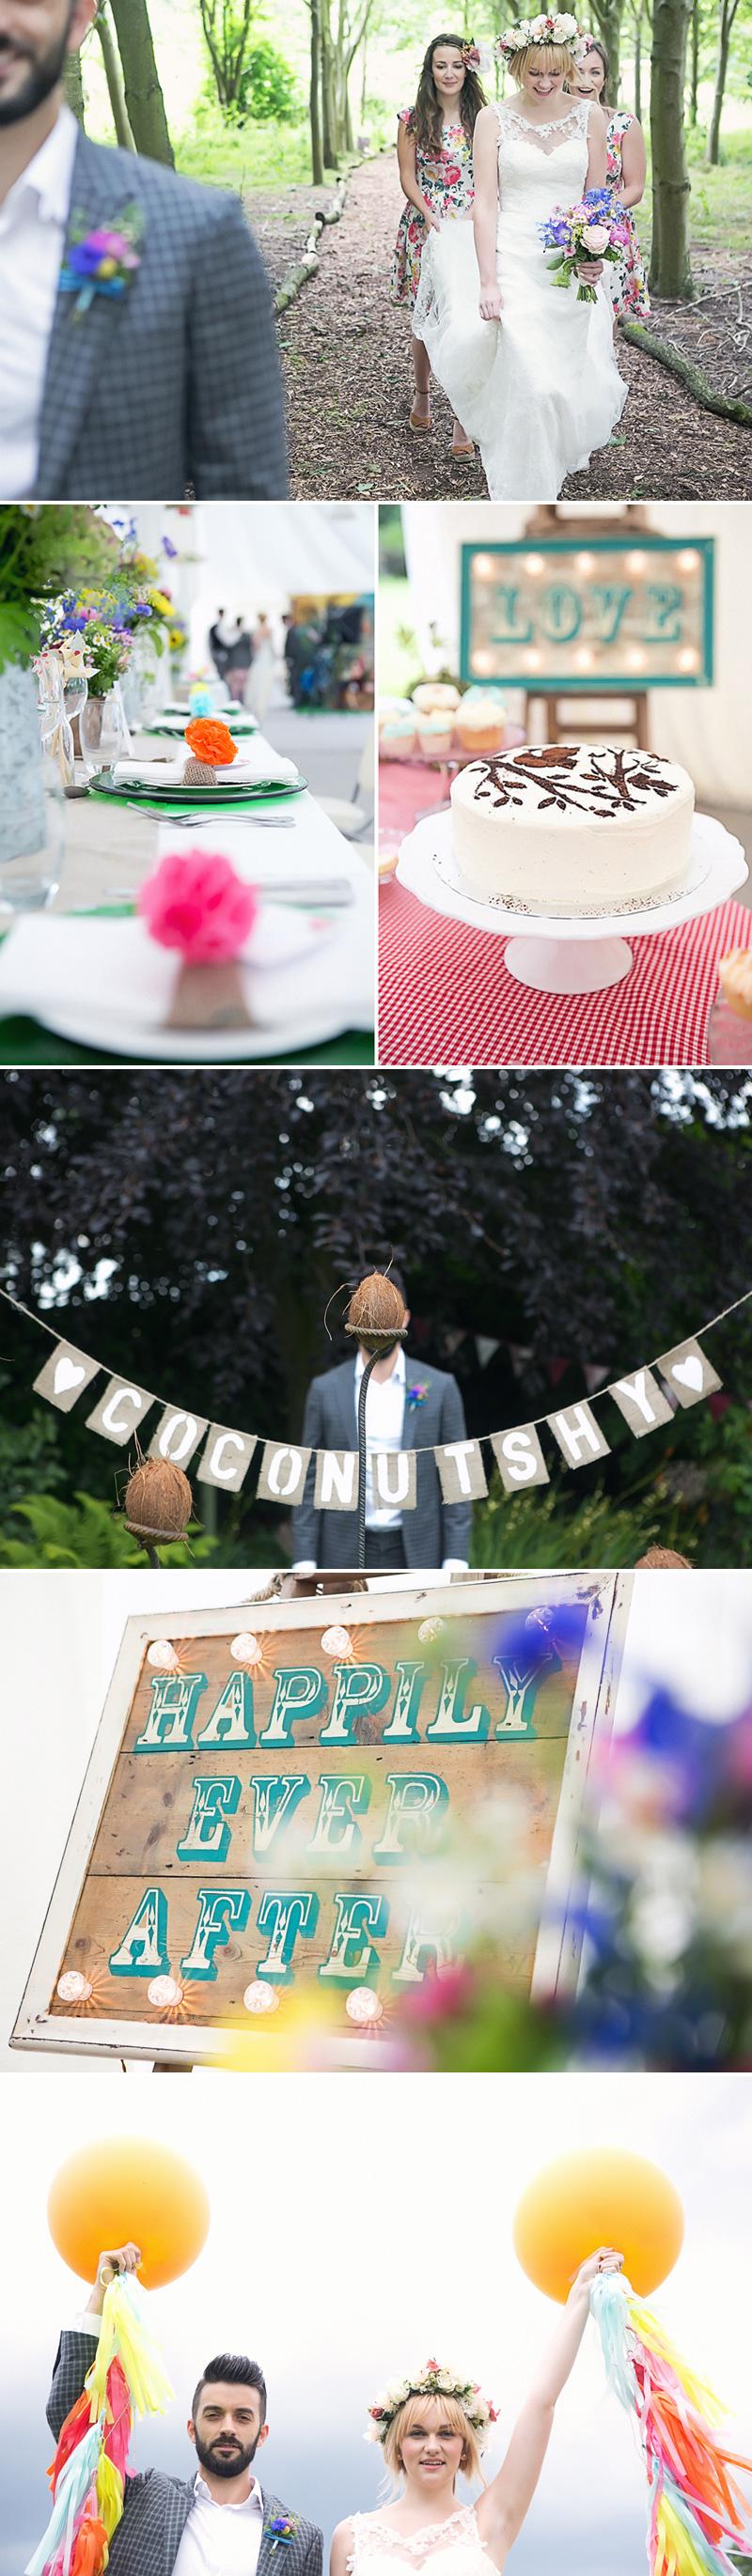 village-fete-themed-wedding-styled-shoot-kenton-hall-estate-nick-ilott-photography-coco-wedding-venues-layer-3